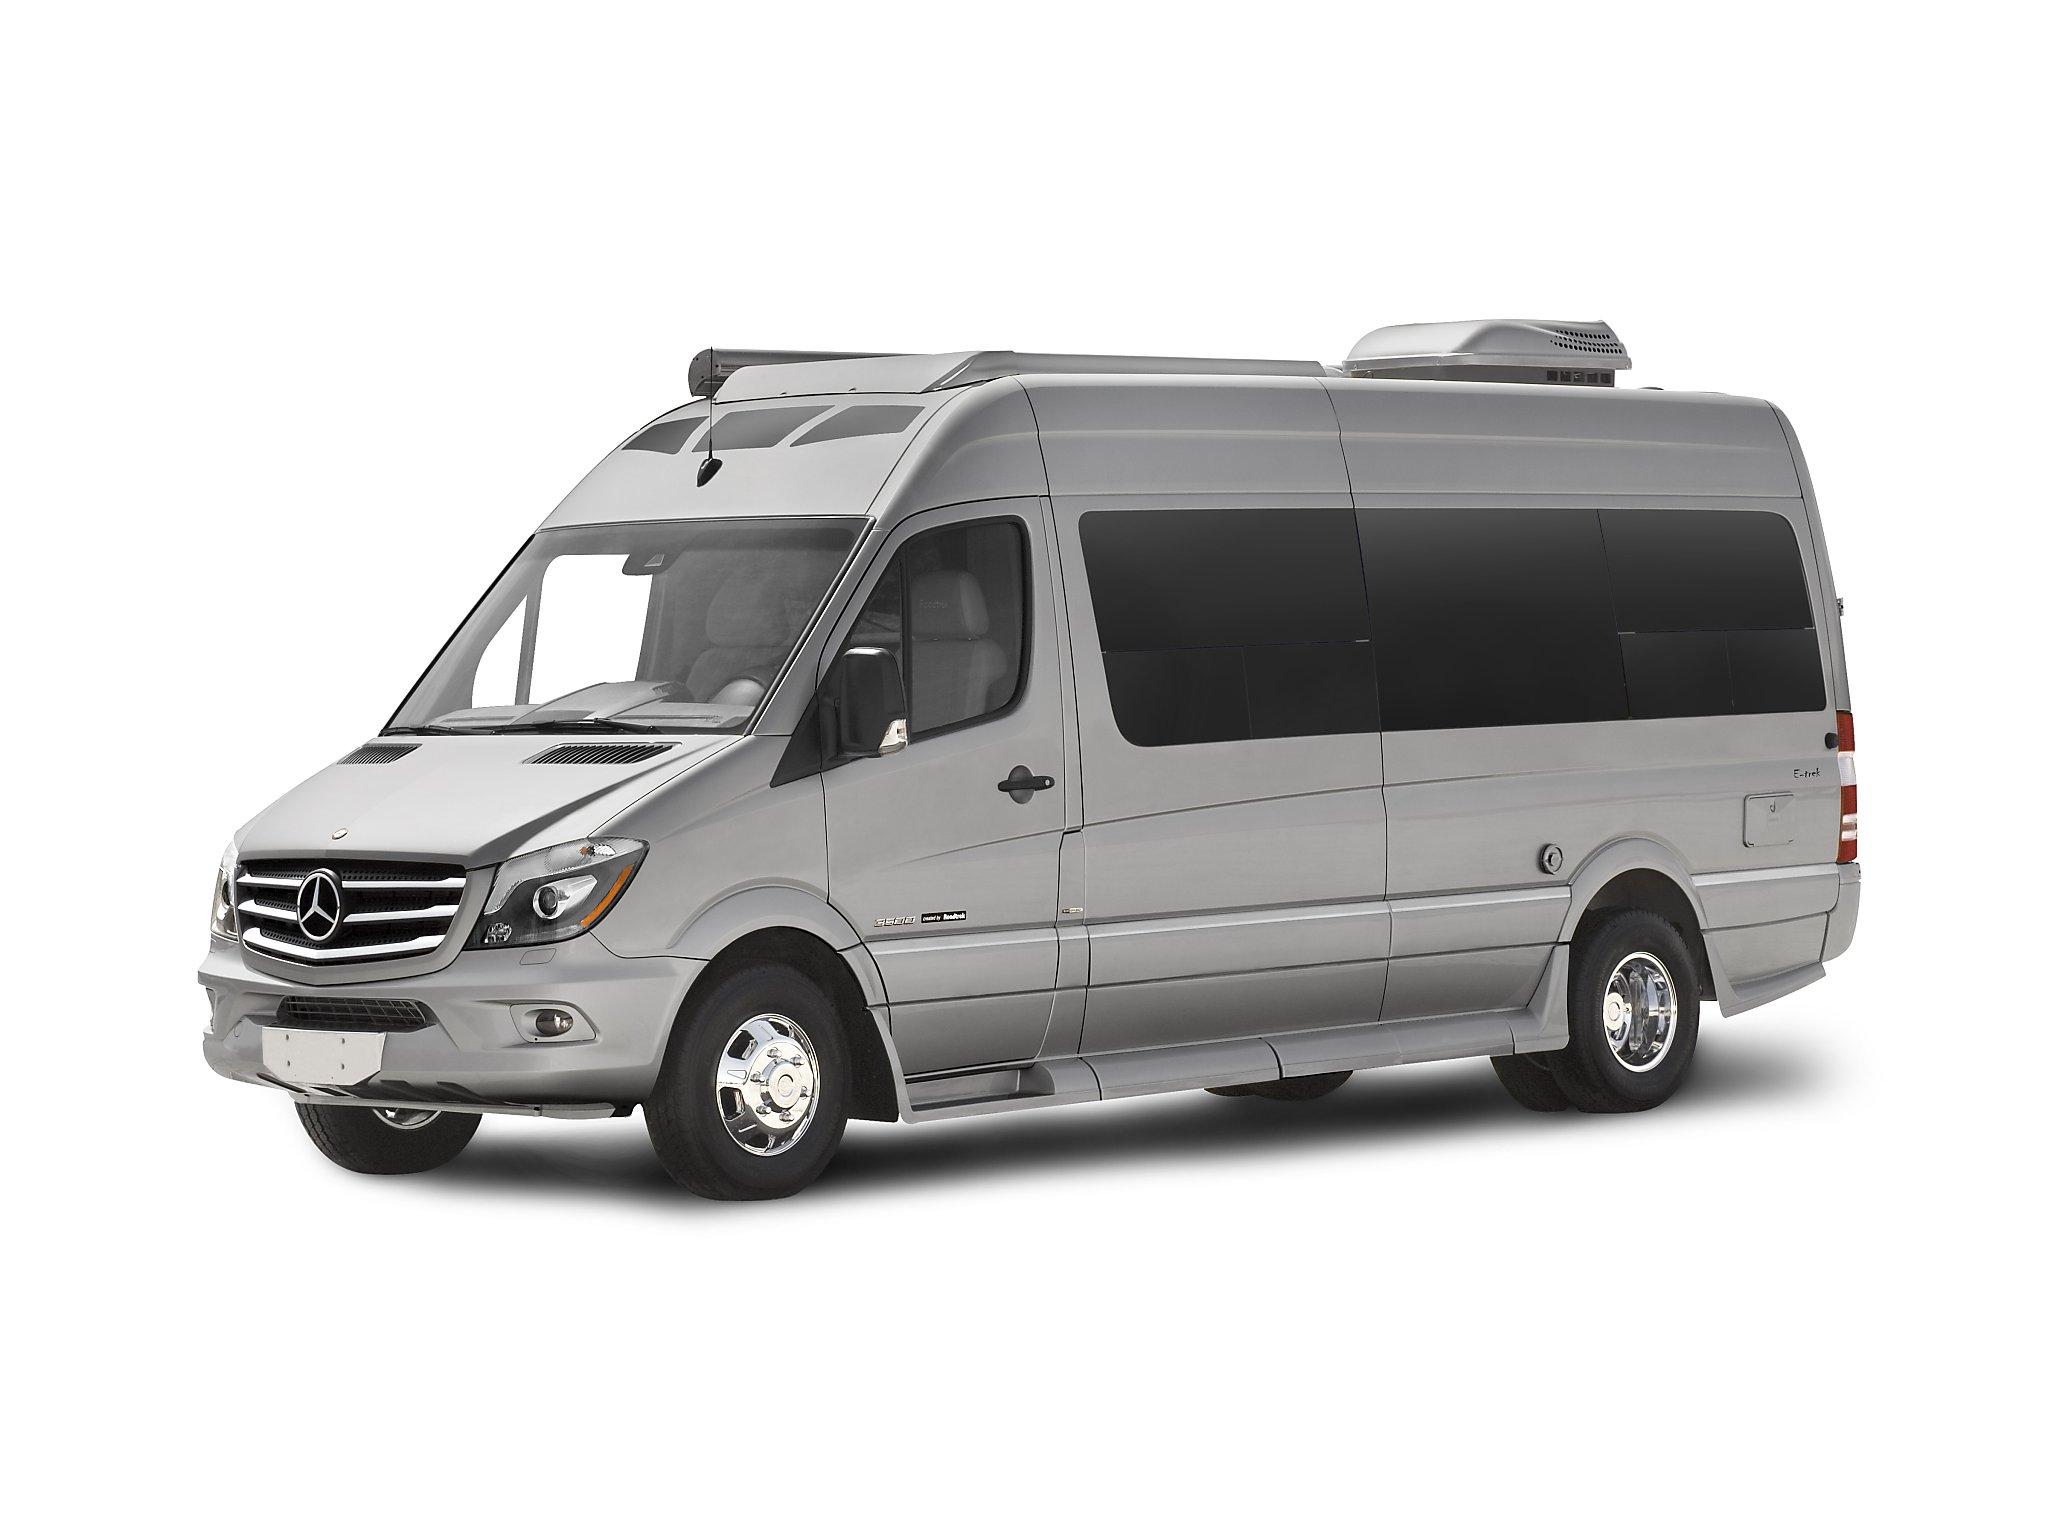 Camper Vans Simpler And Sleeker Than Rvs Gain Popularity